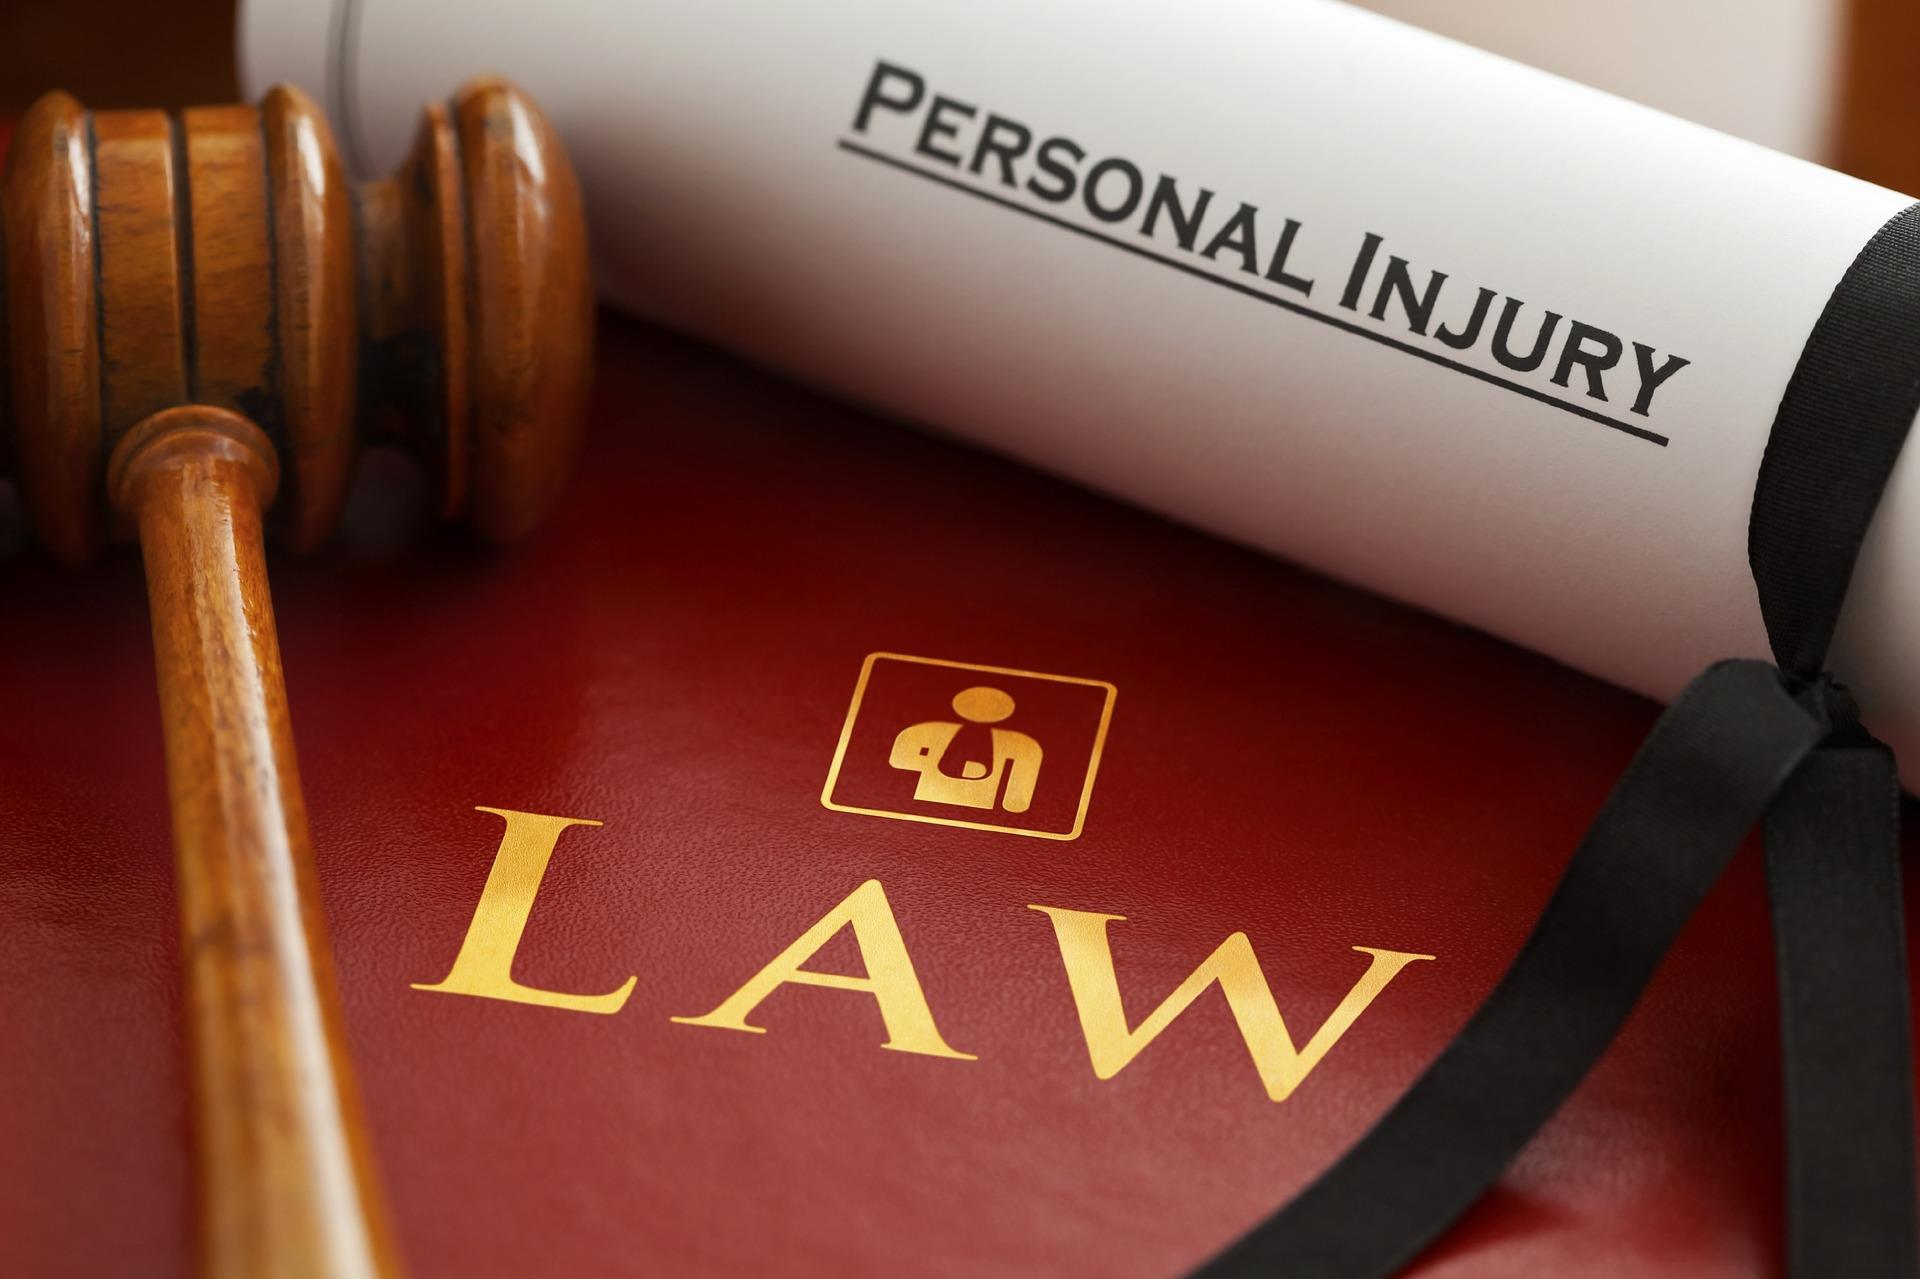 Filing a Personal Injury Claim - The Basics